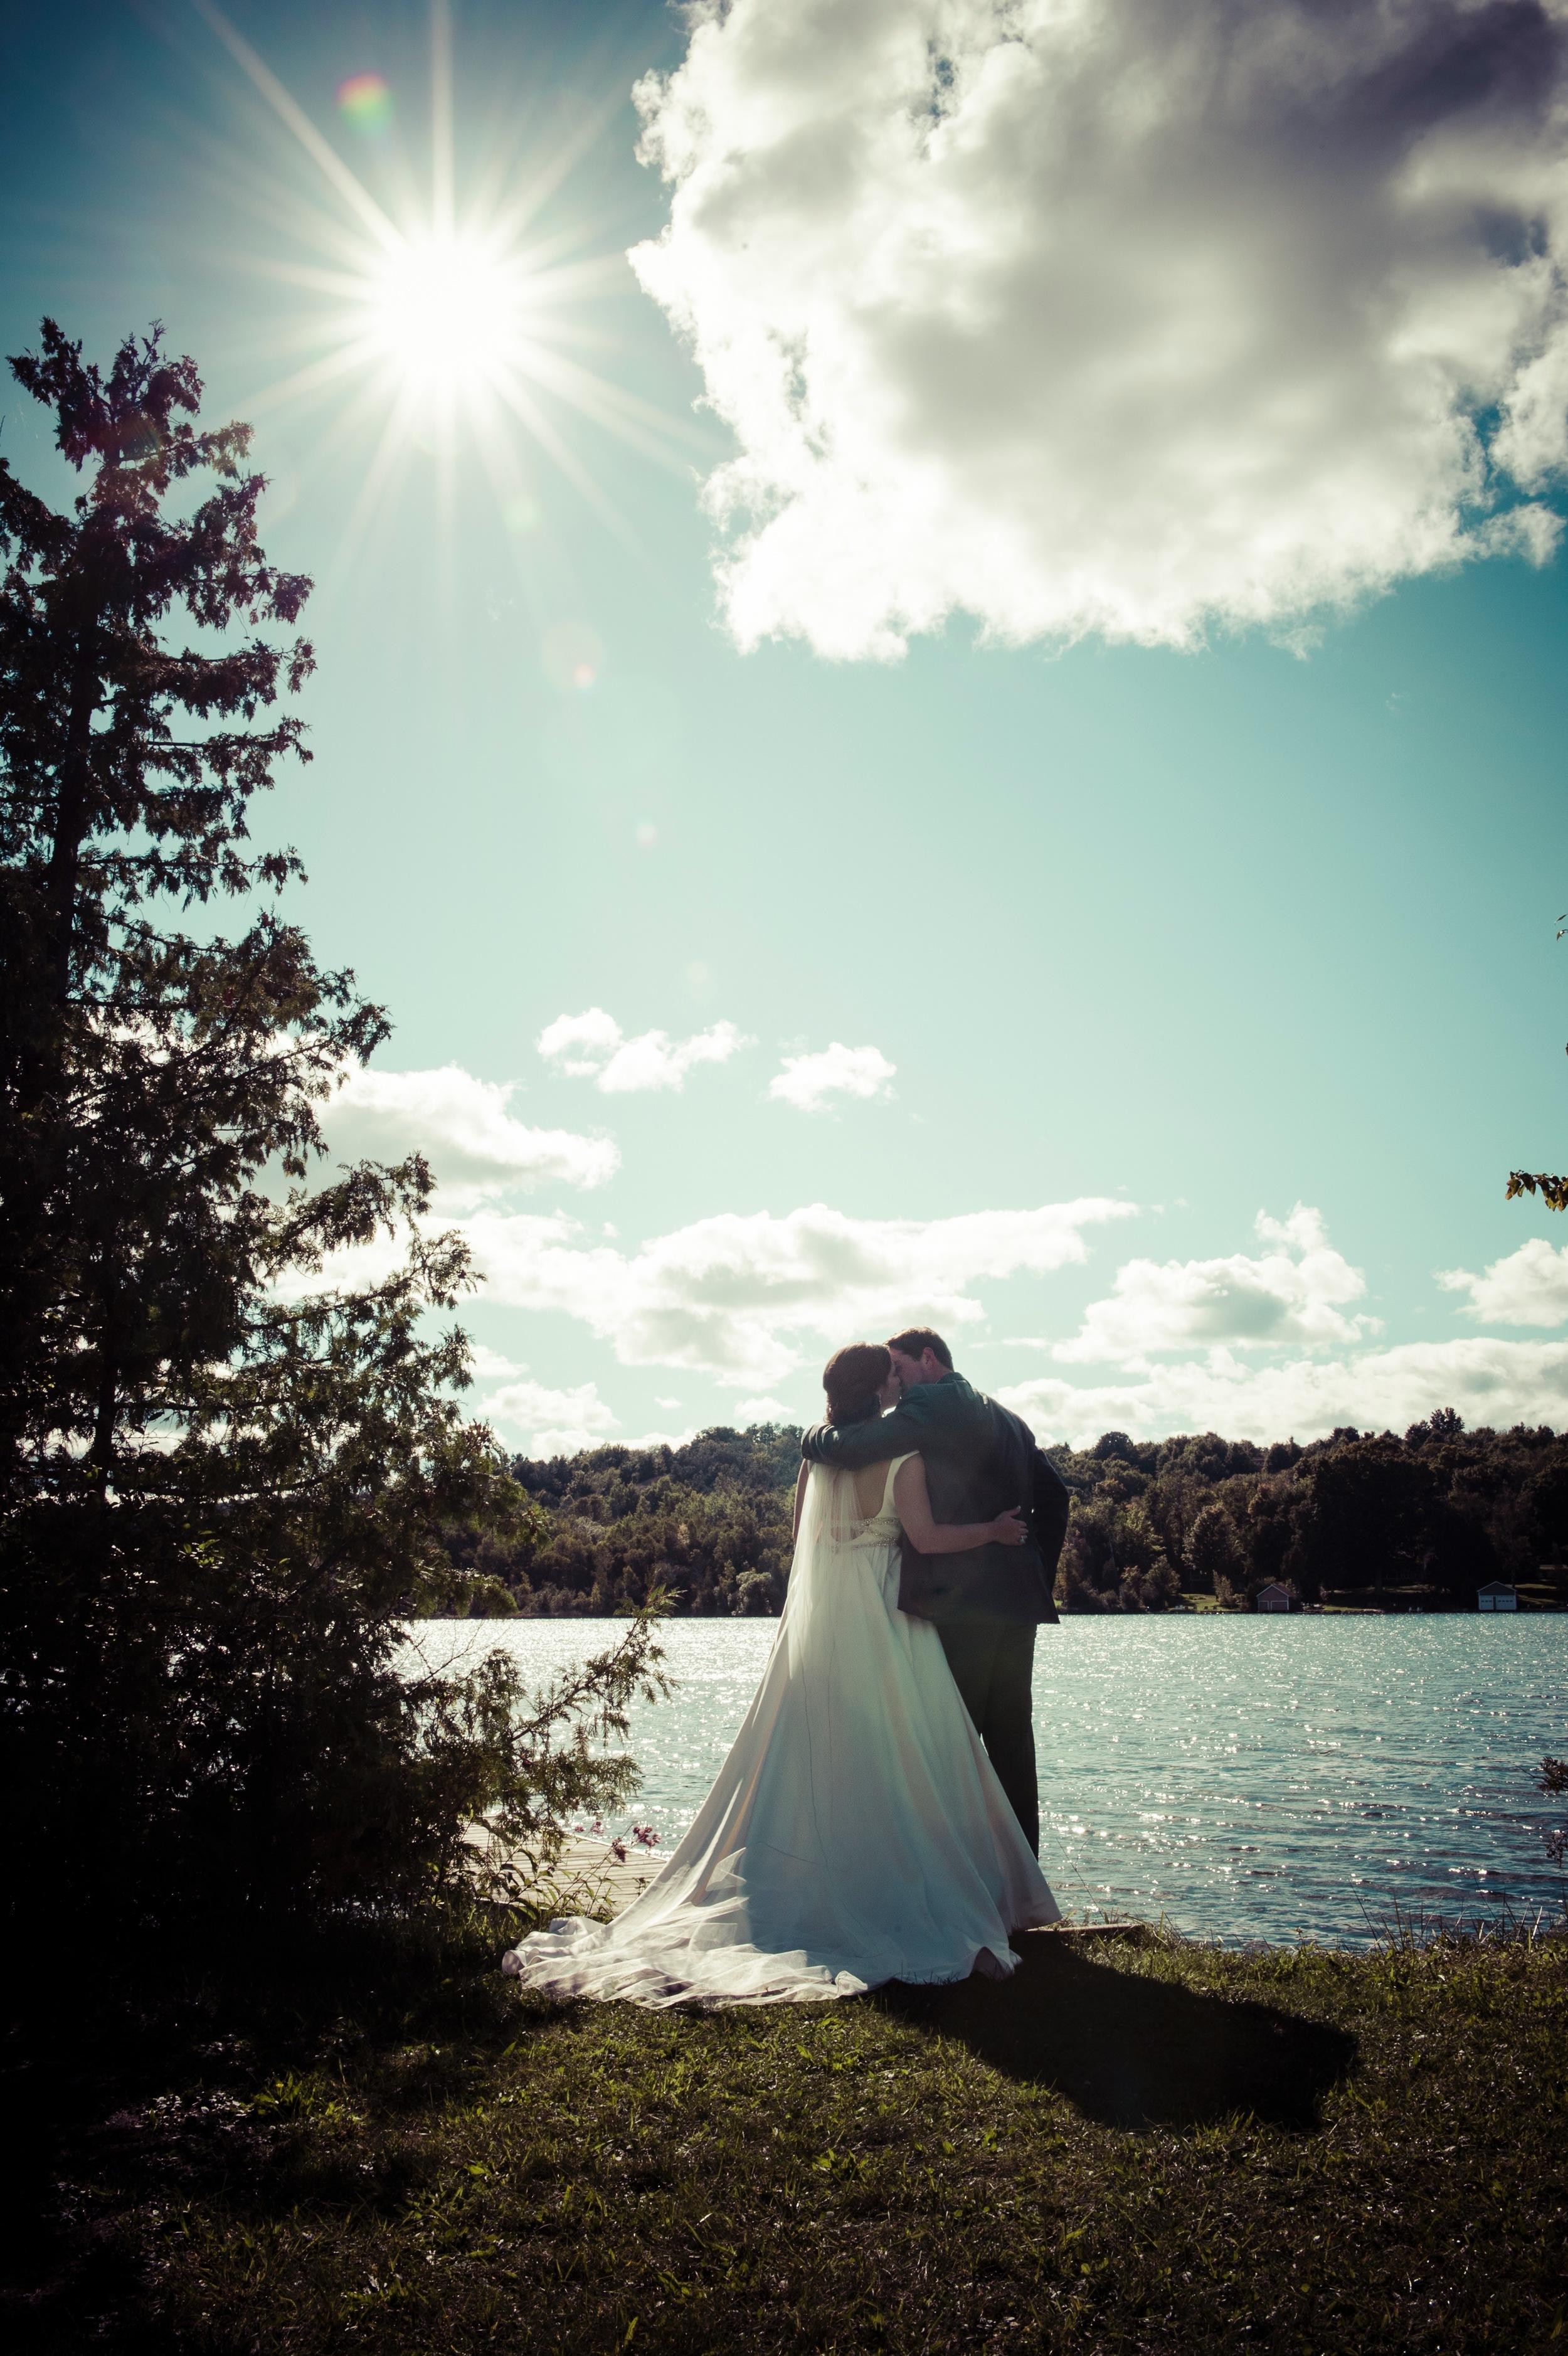 Claire & Evan | Lake Leelanau, MI